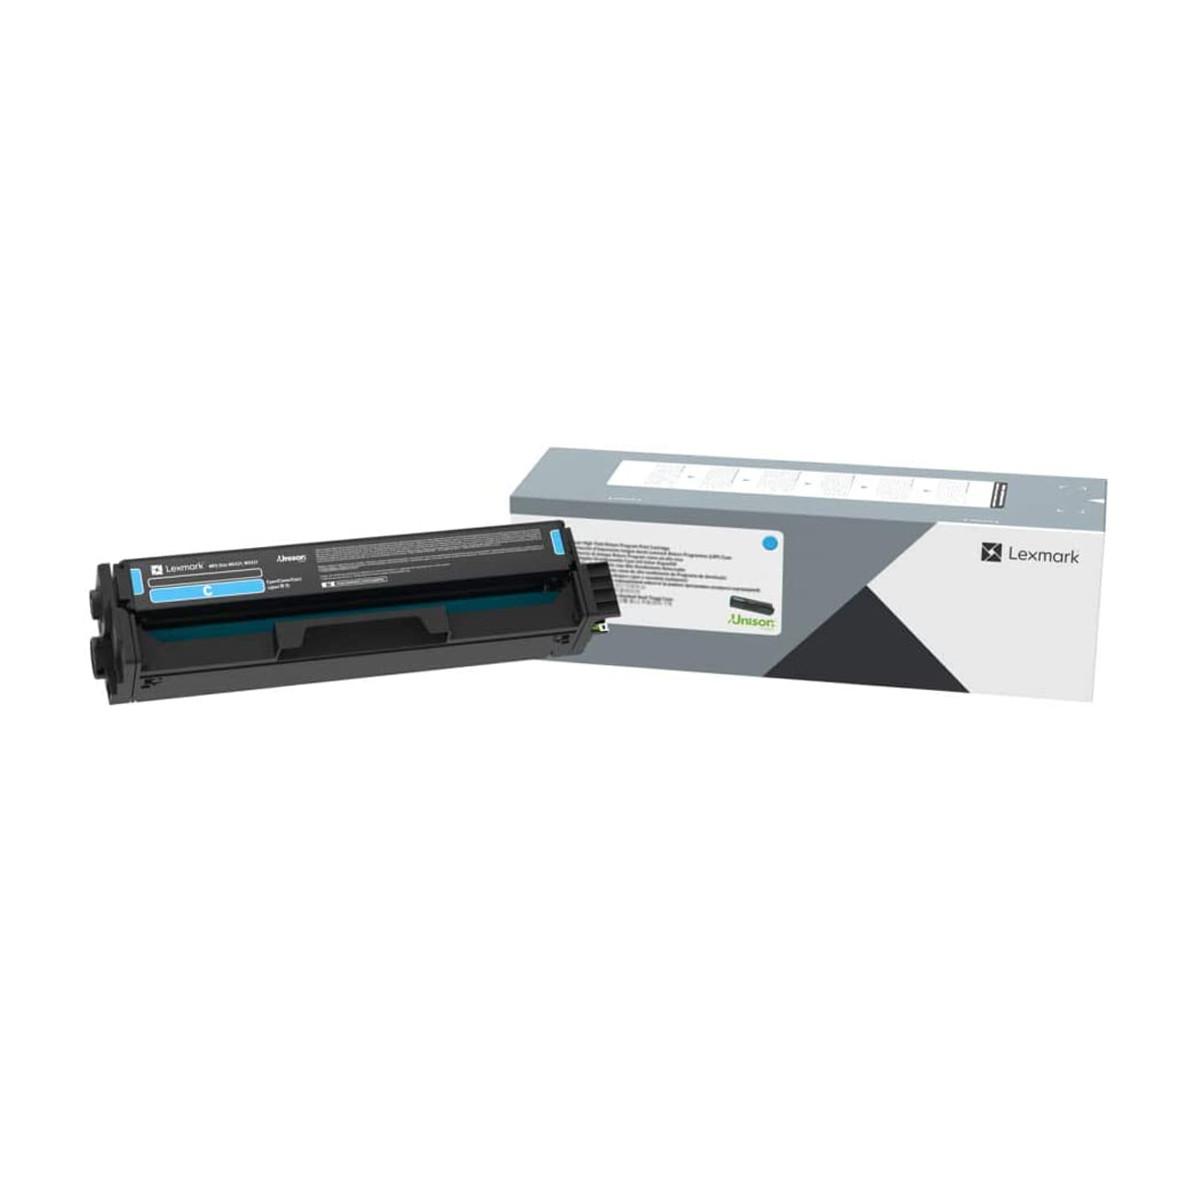 Toner Lexmark C320020 C3200 C3240C0 Ciano | MC3224ADWE MC3224 C3224DW C3224 | Original 1.5k